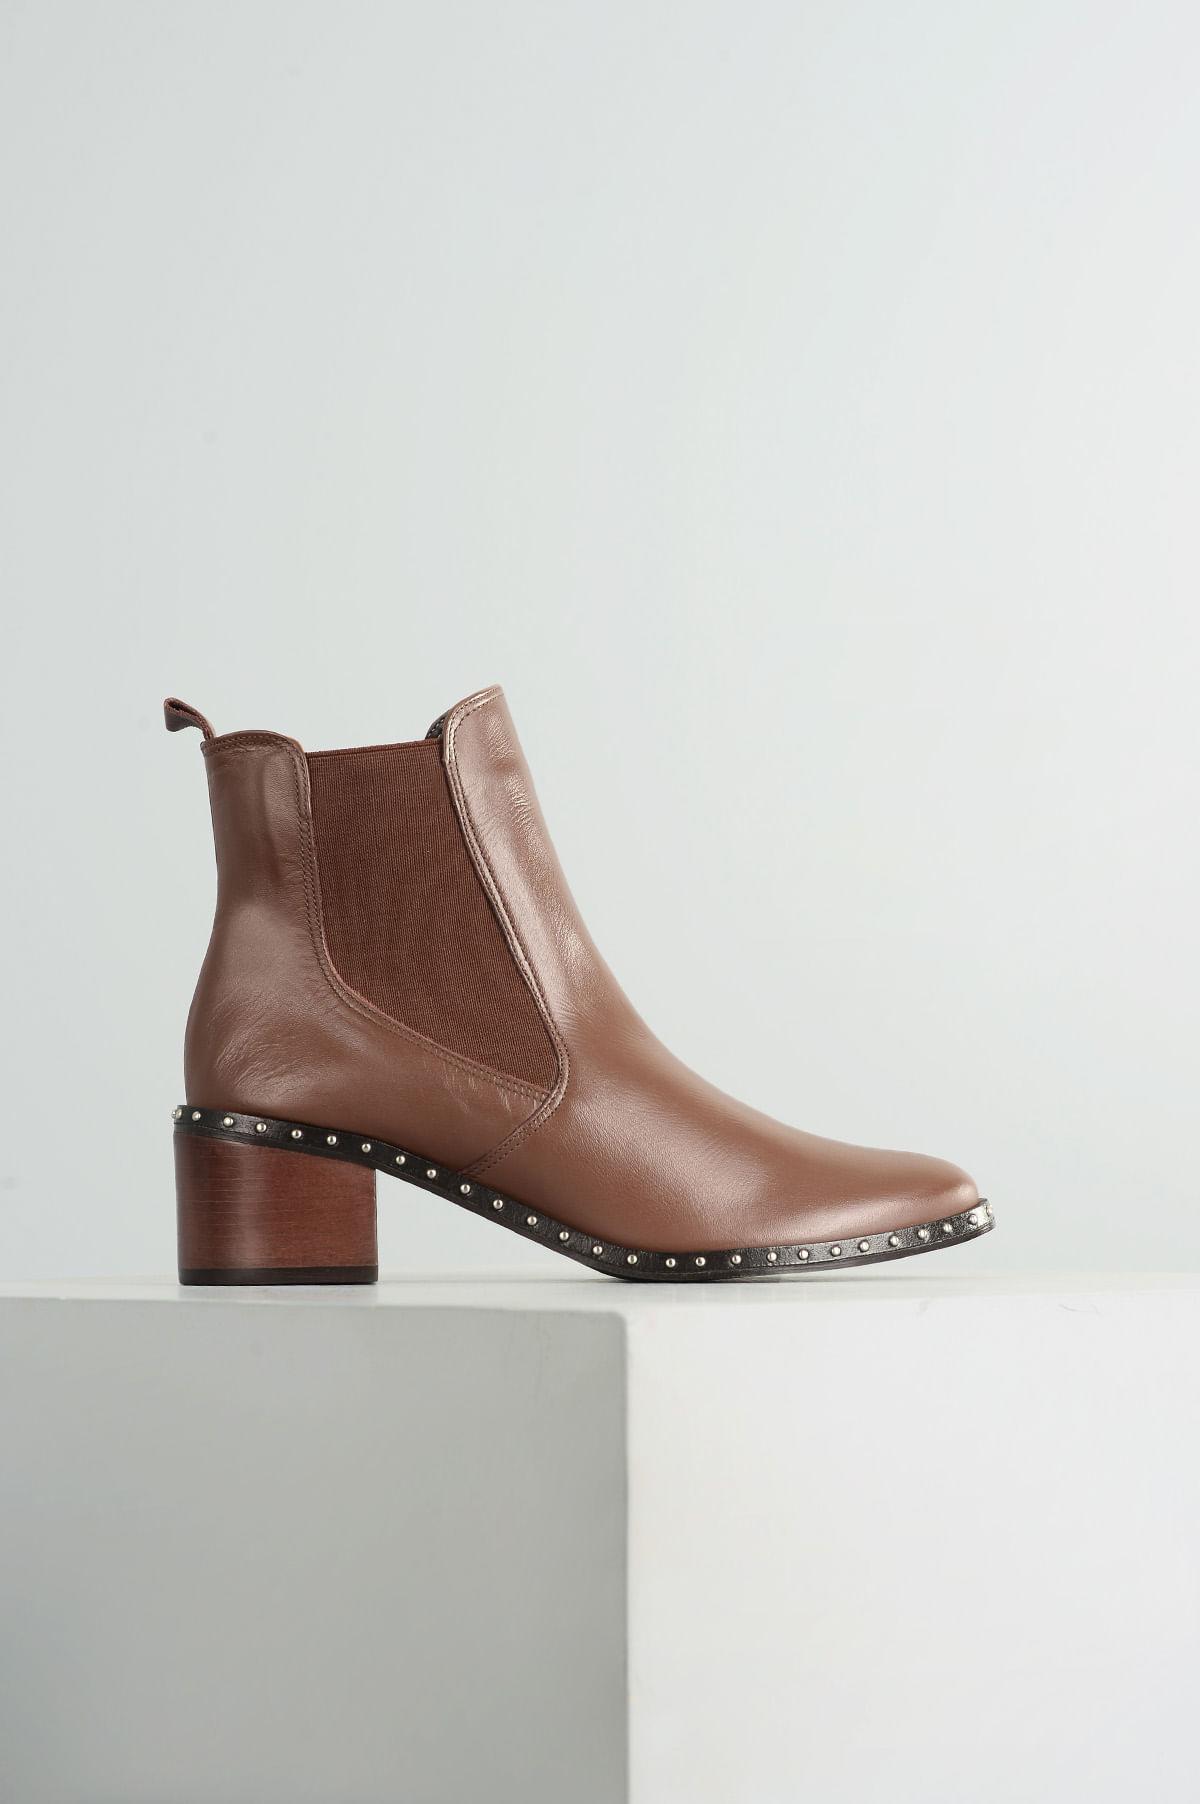 aca88be5d3 Ankle Boot Feminino Gardner Mundial CR - CAFE - Mundial Calçados